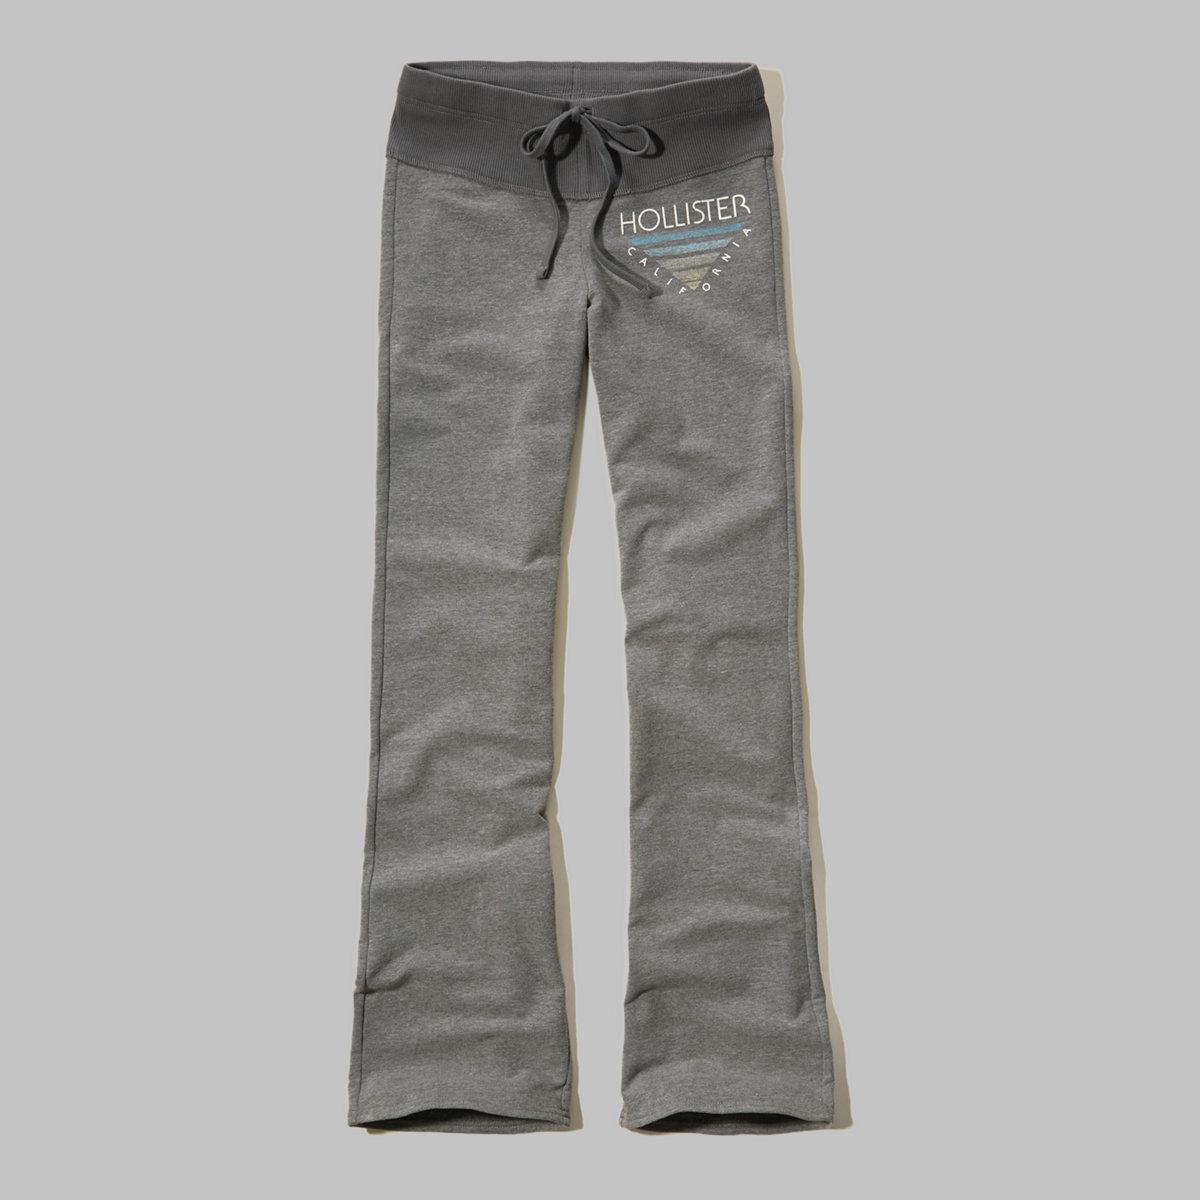 Hollister Graphic Flare Sweatpants